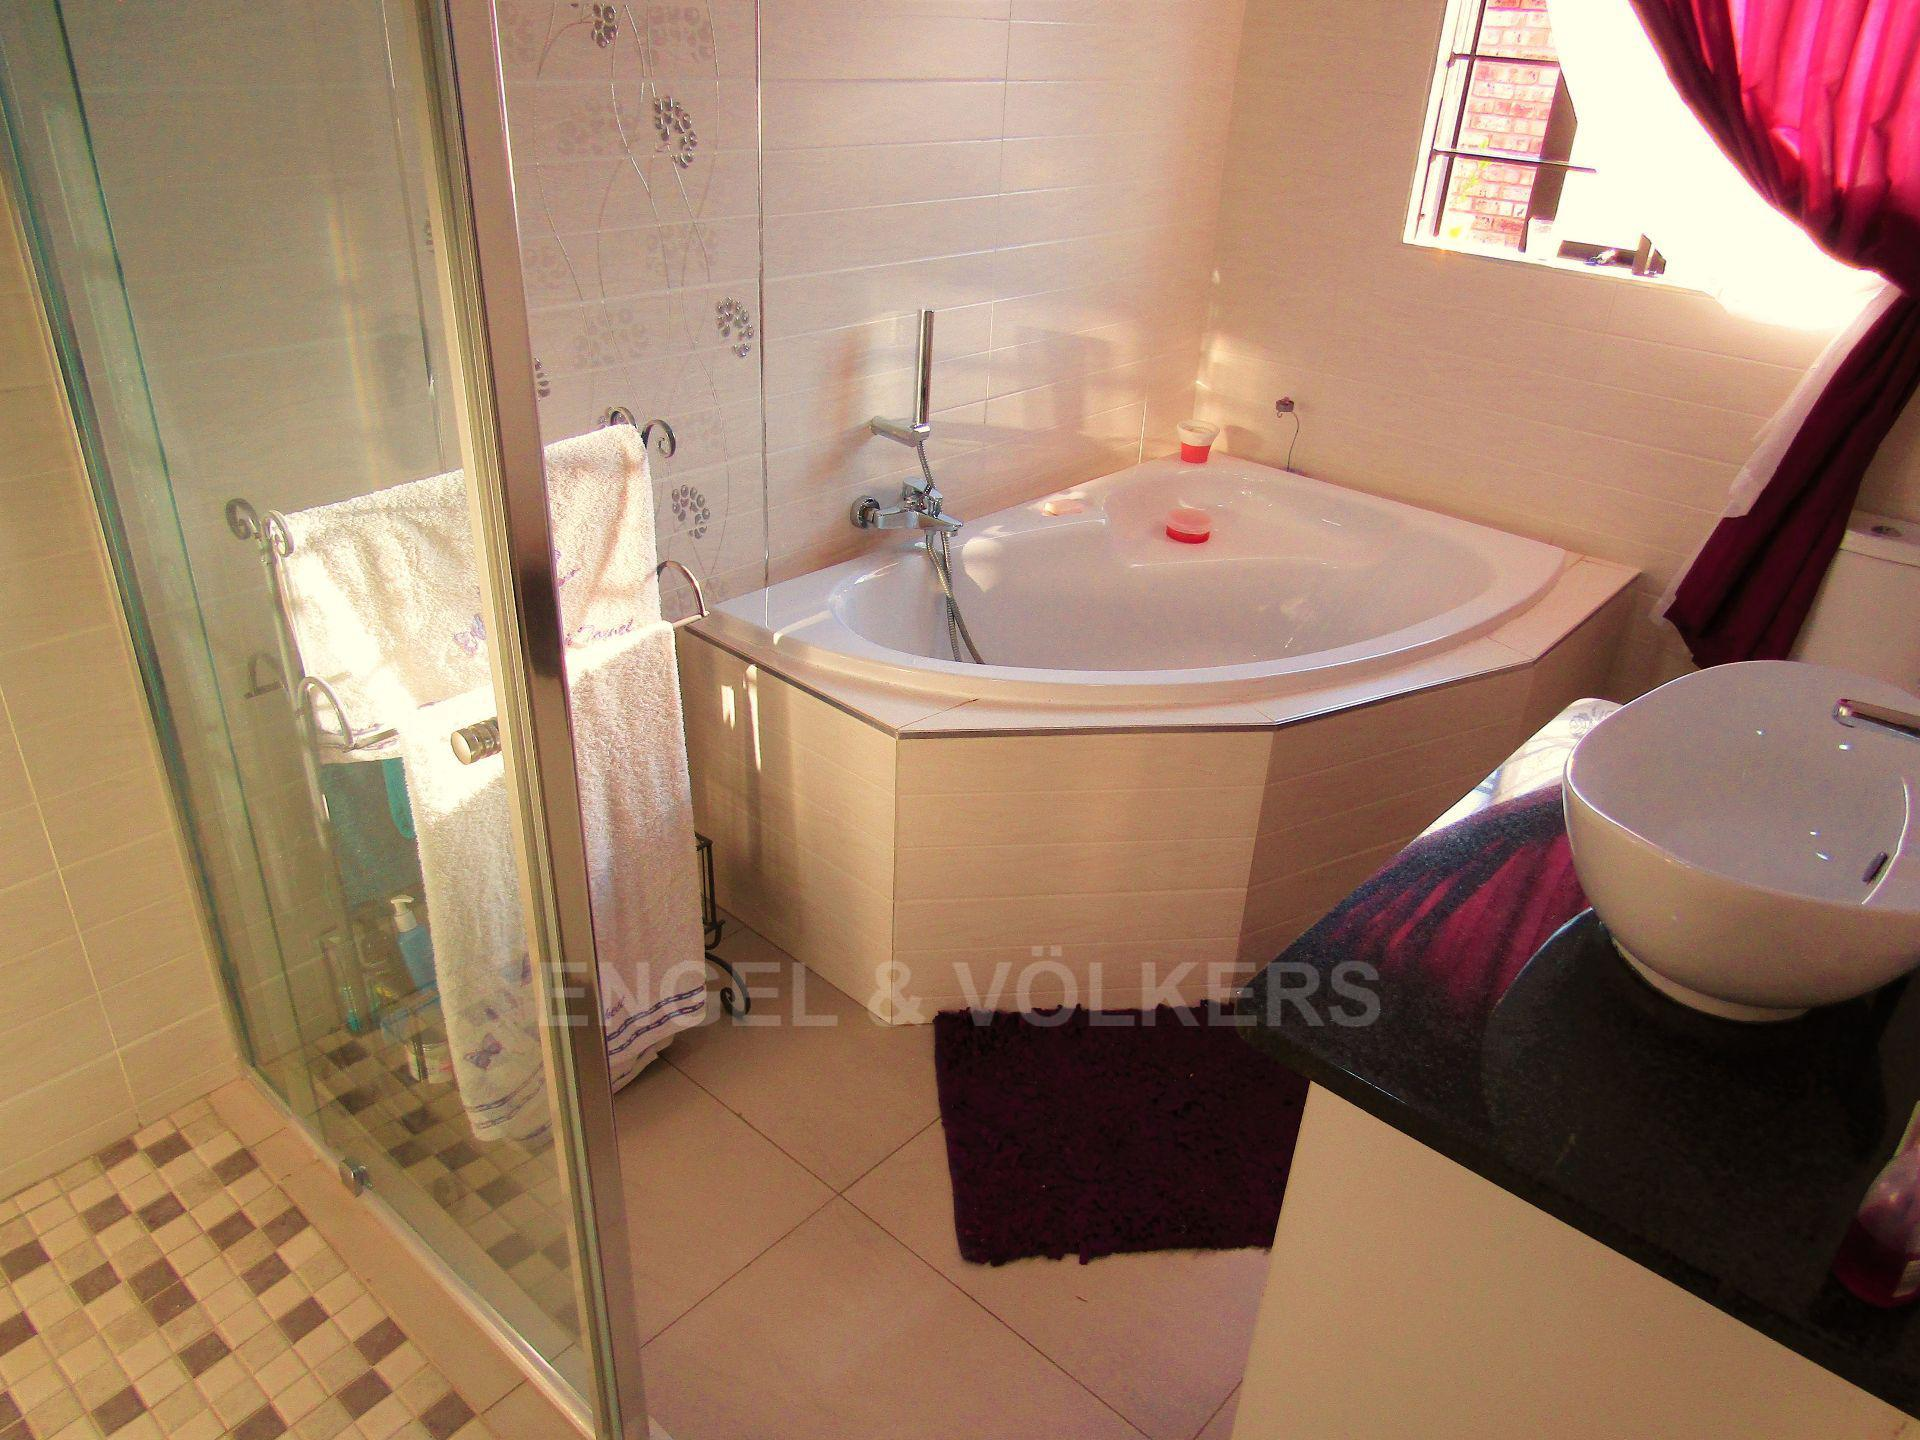 Lifestyle Estate property for sale. Ref No: 13458759. Picture no 23